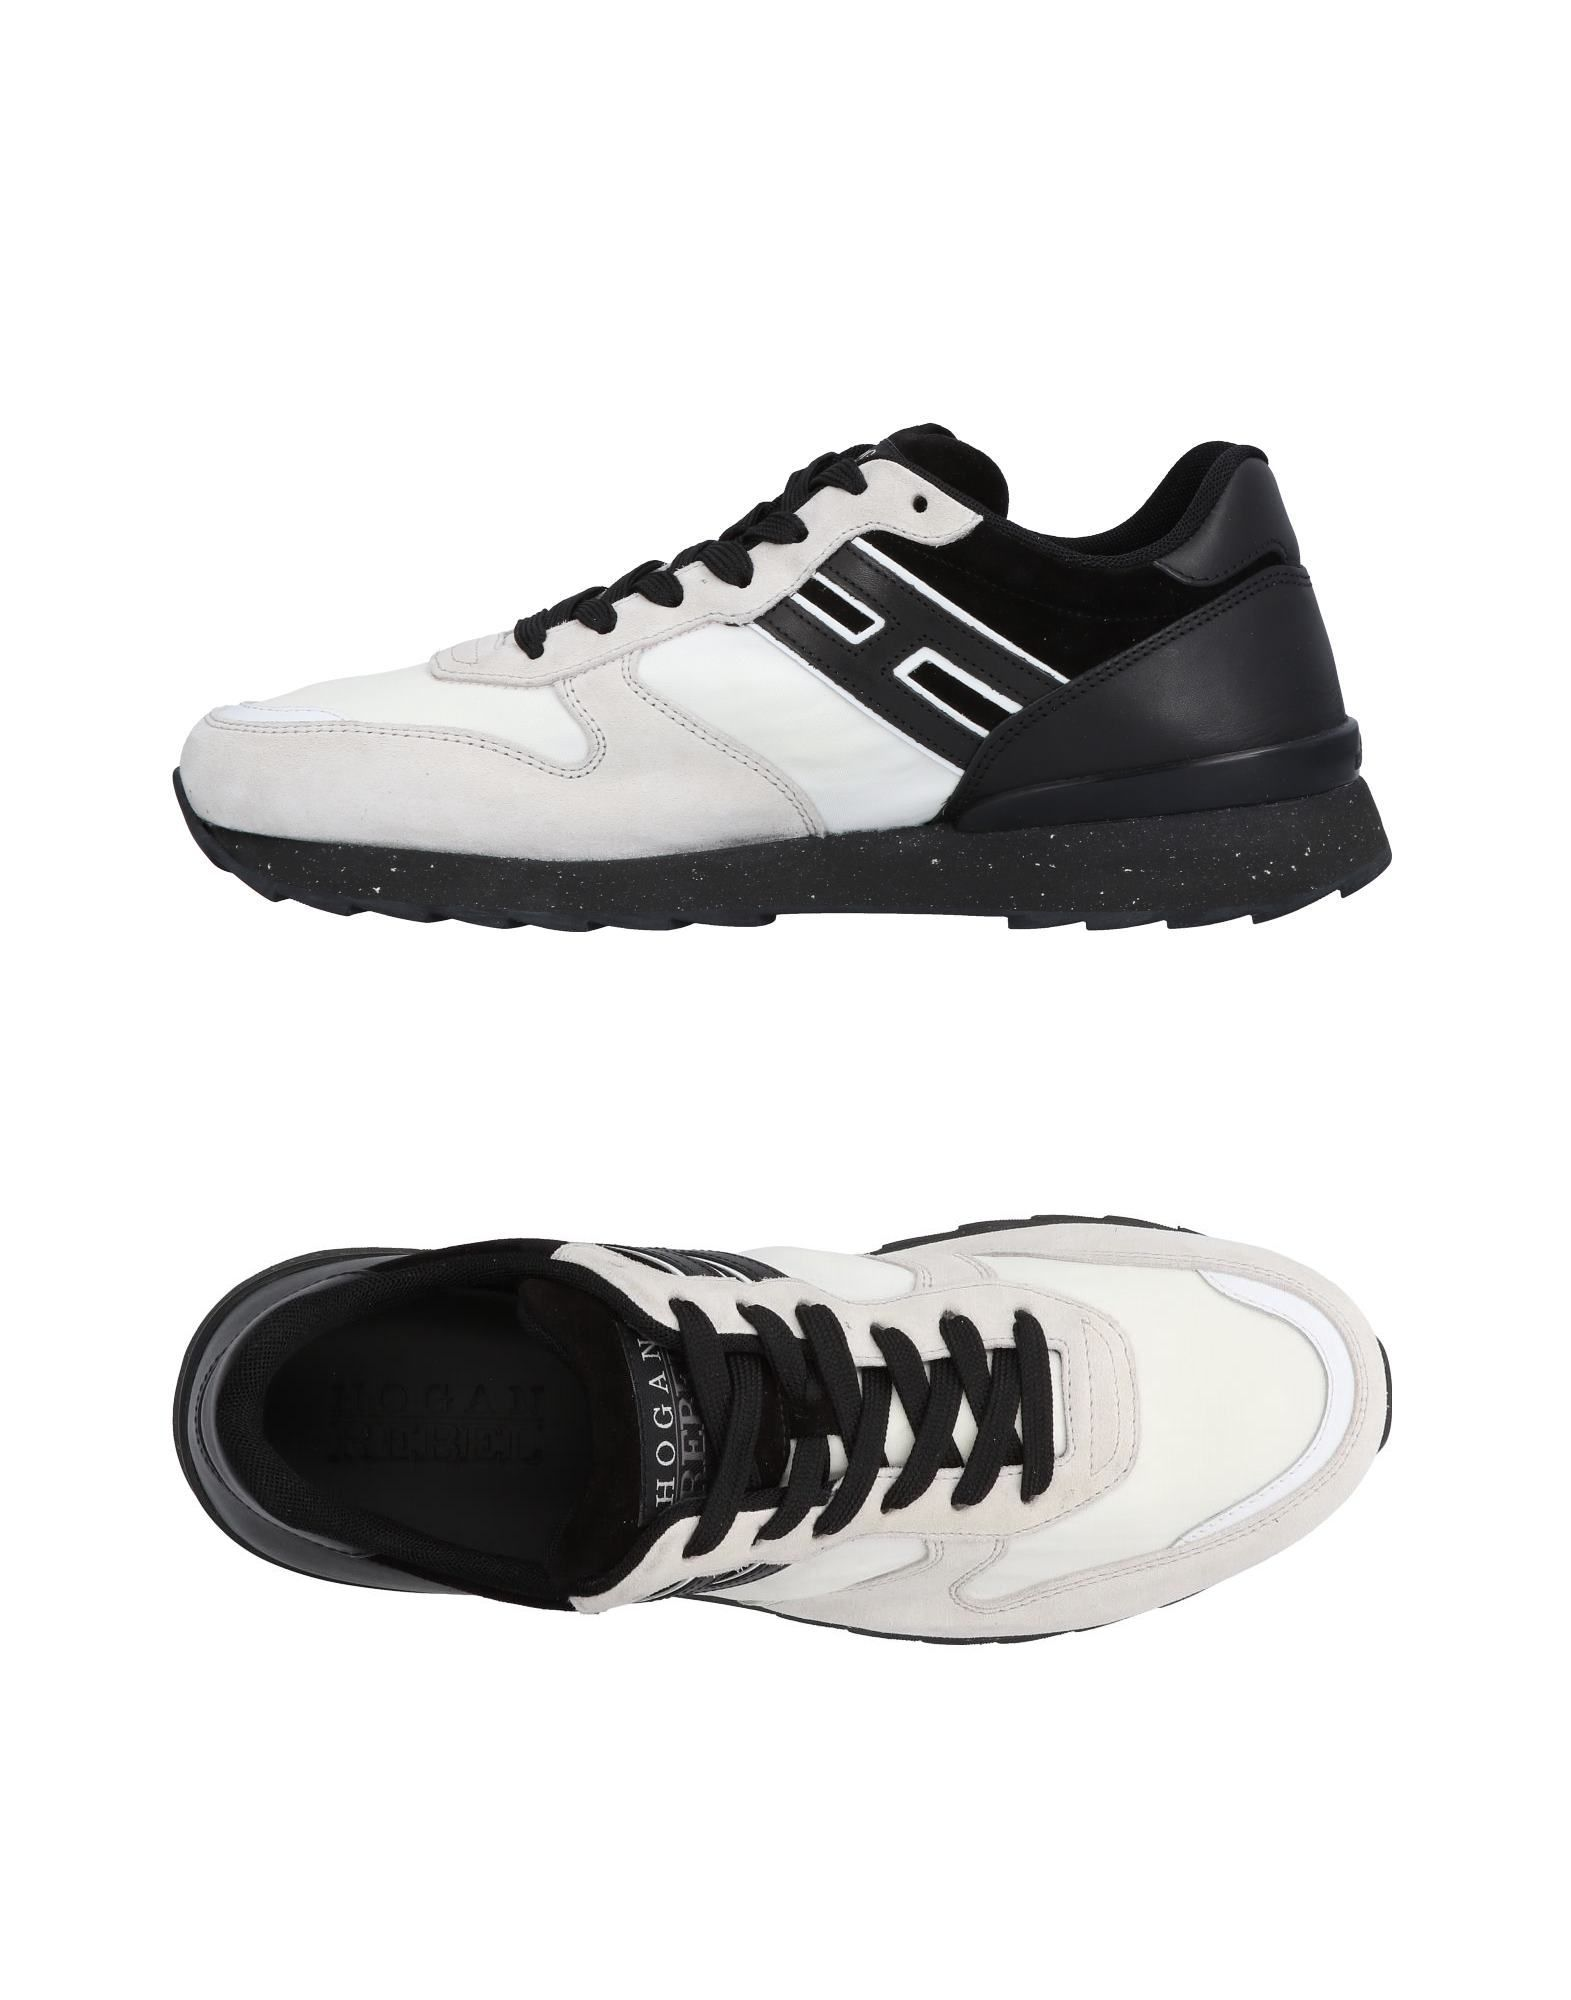 Hogan Rebel Sneakers Herren  11481810RD Gute Qualität beliebte Schuhe